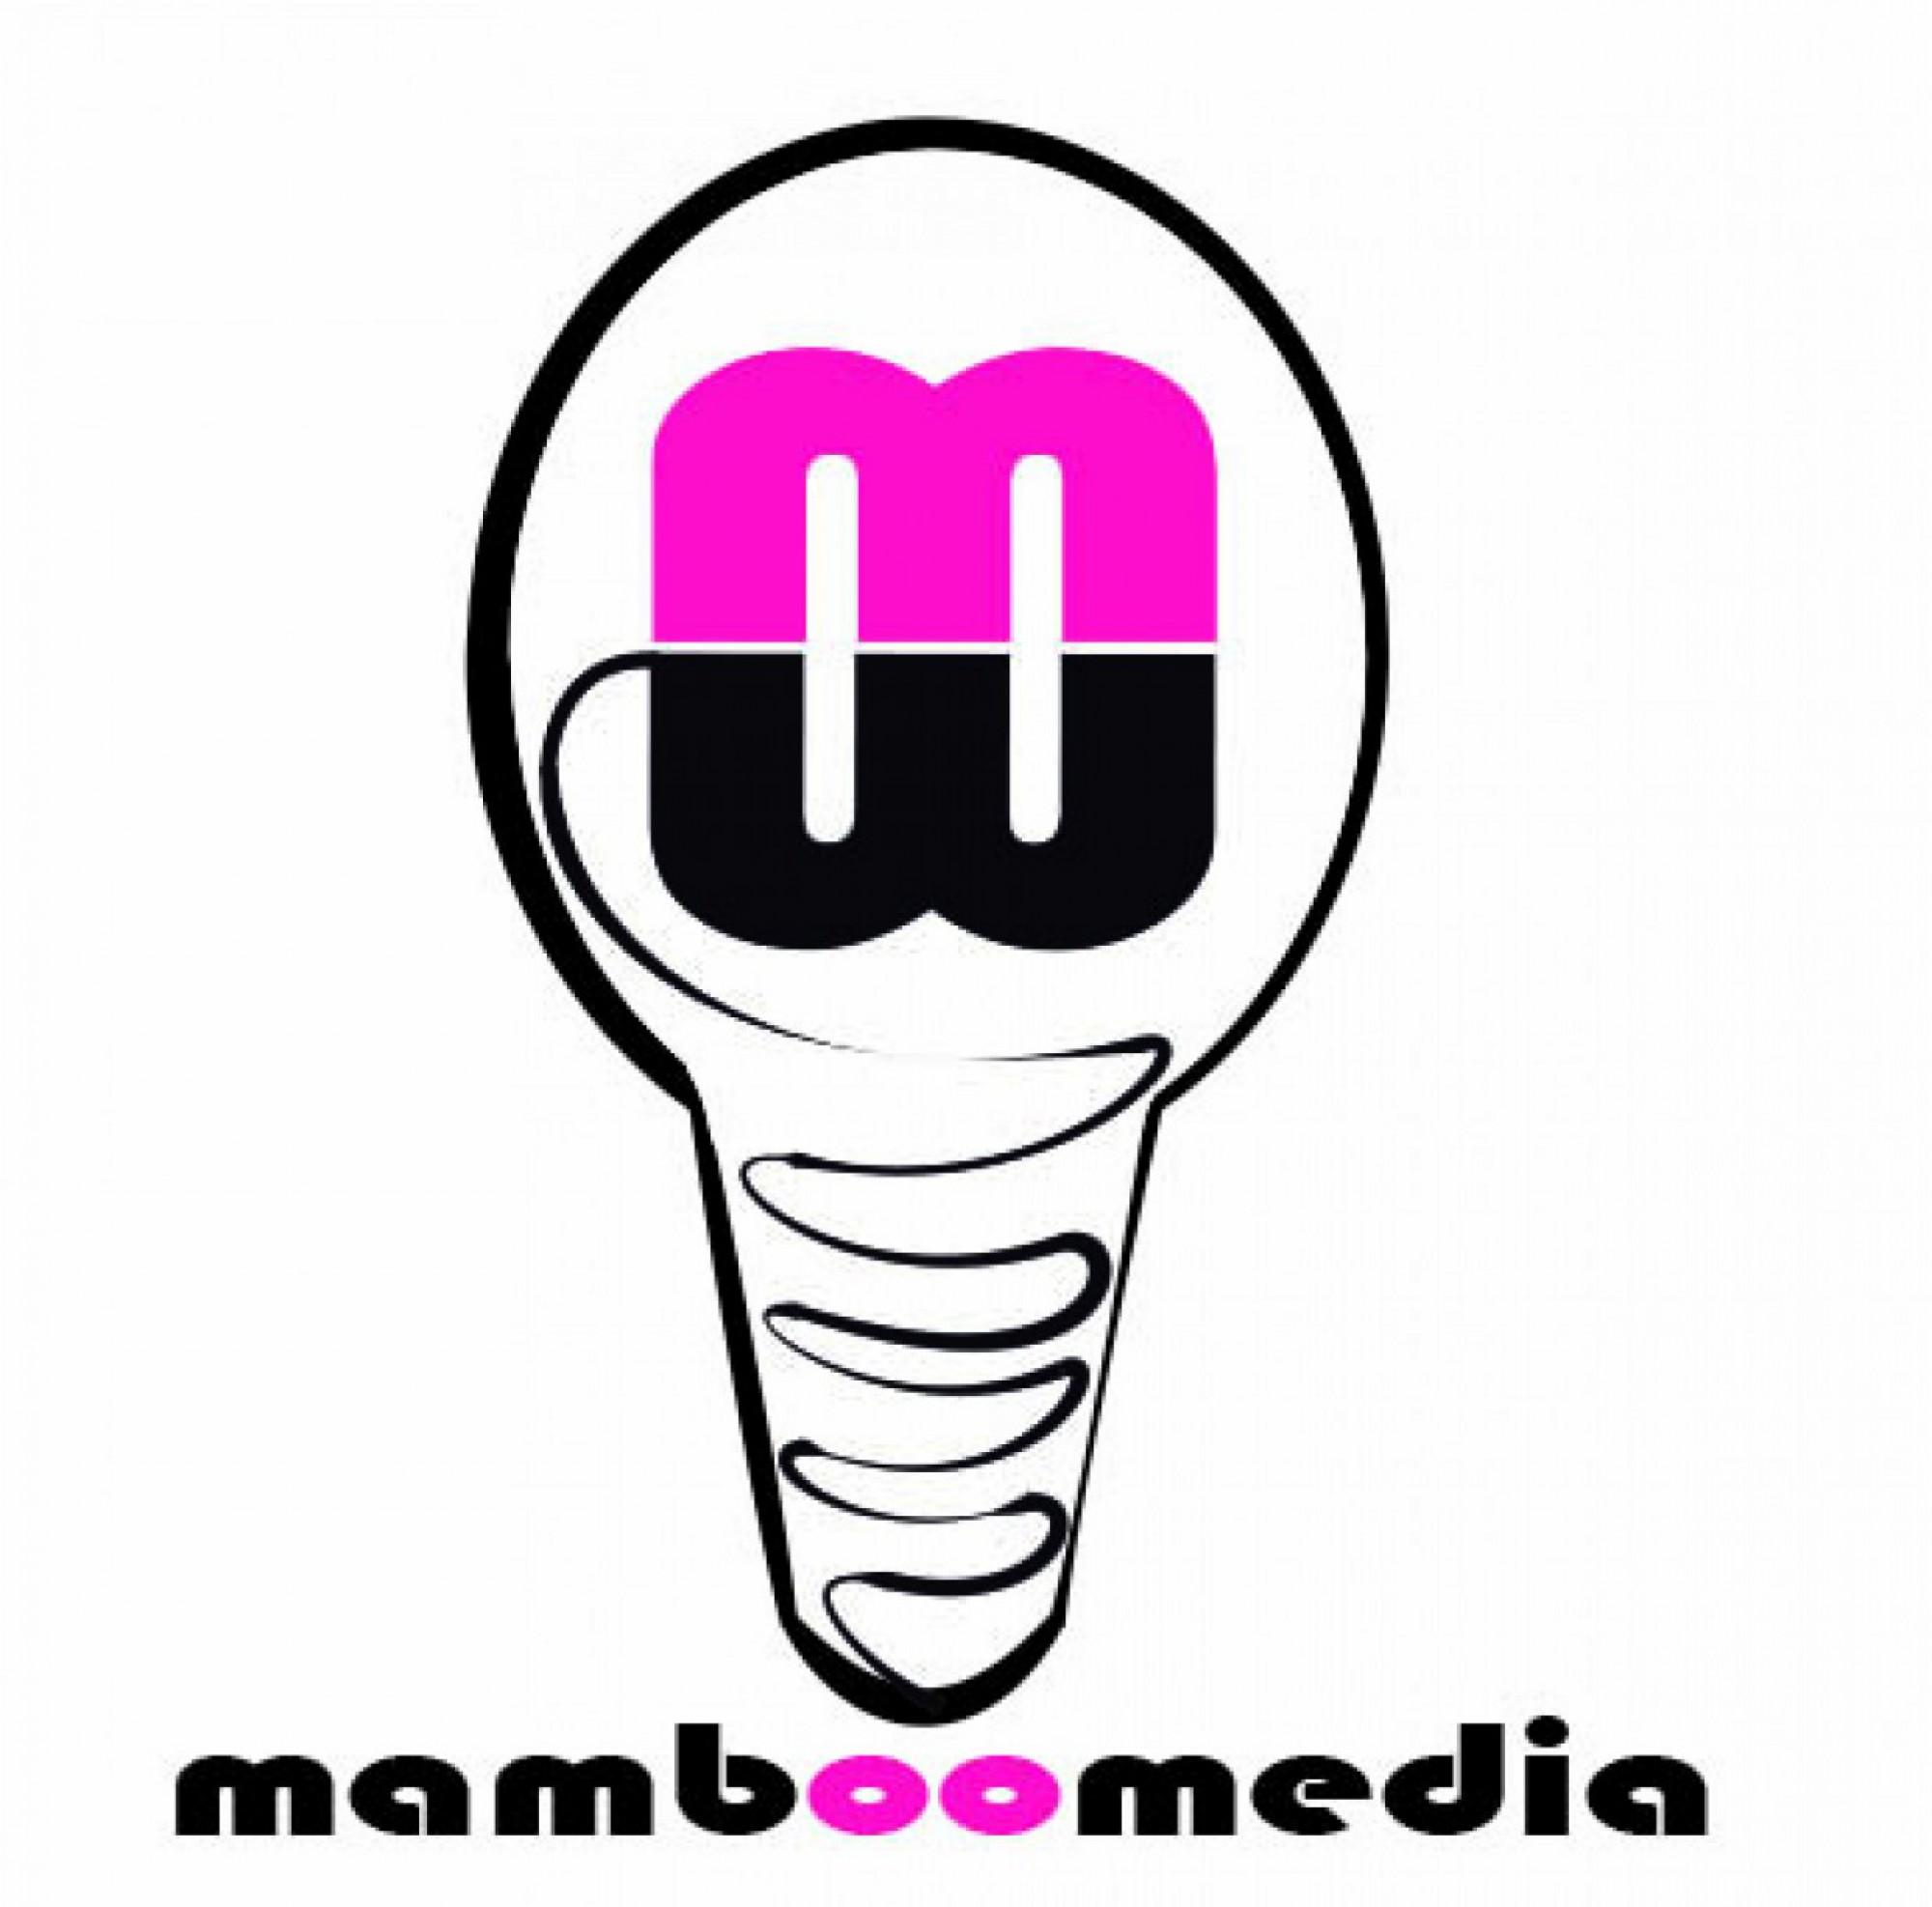 Mamboo Media